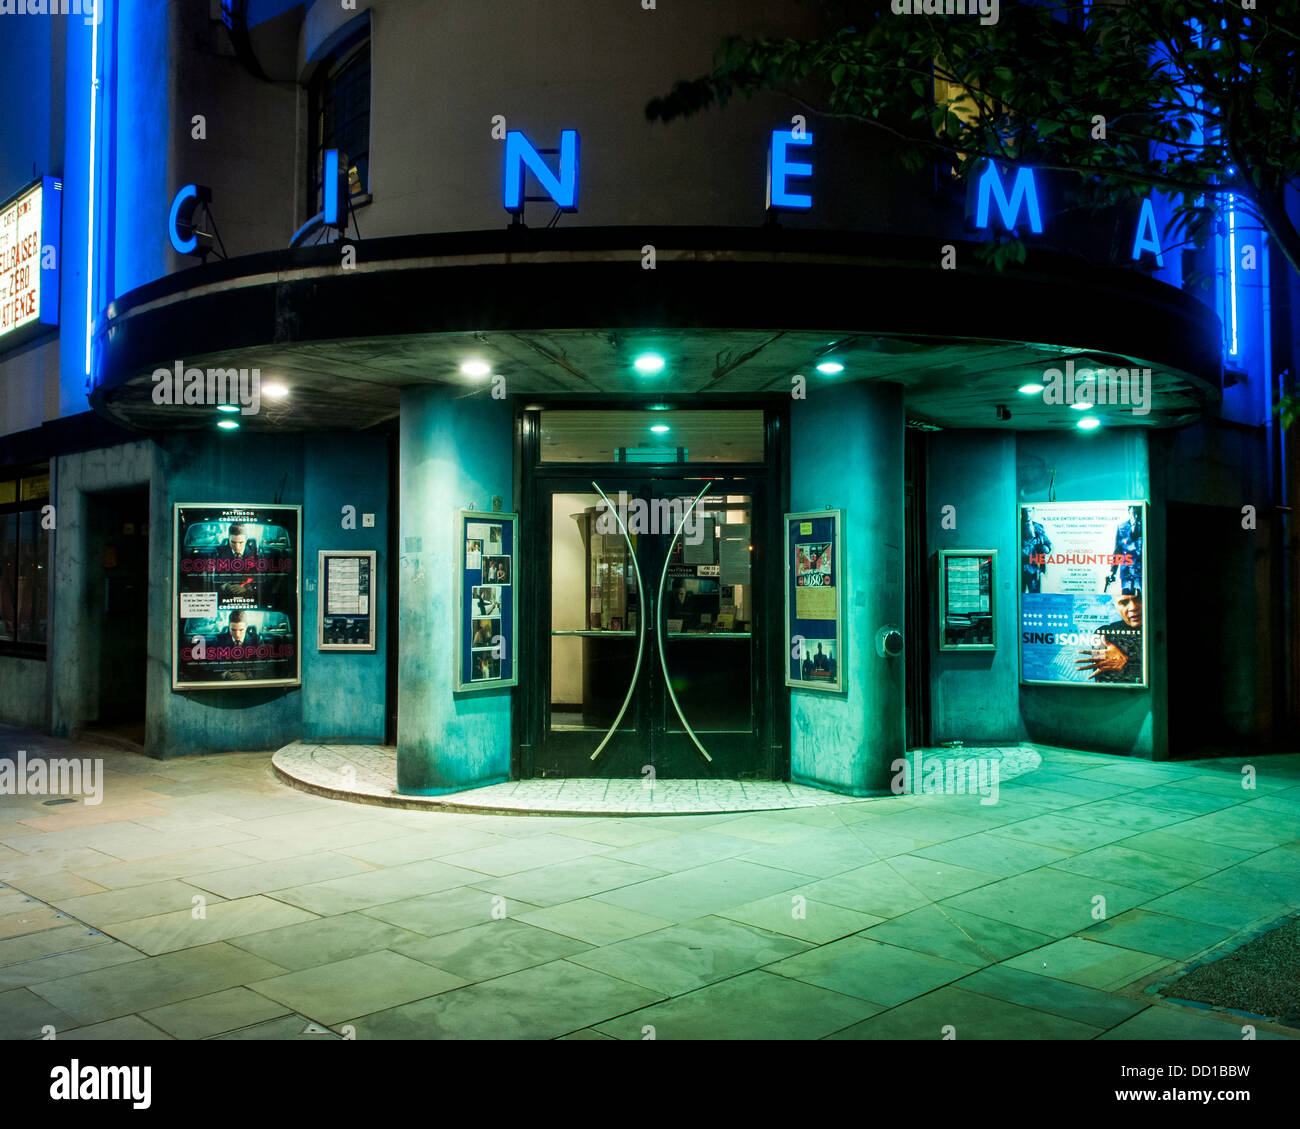 Rio Cinema, London, United Kingdom. Architect: Burrell Foley Fischer LLP + F E Bromige, 1937. Entrance to cinema Stock Photo